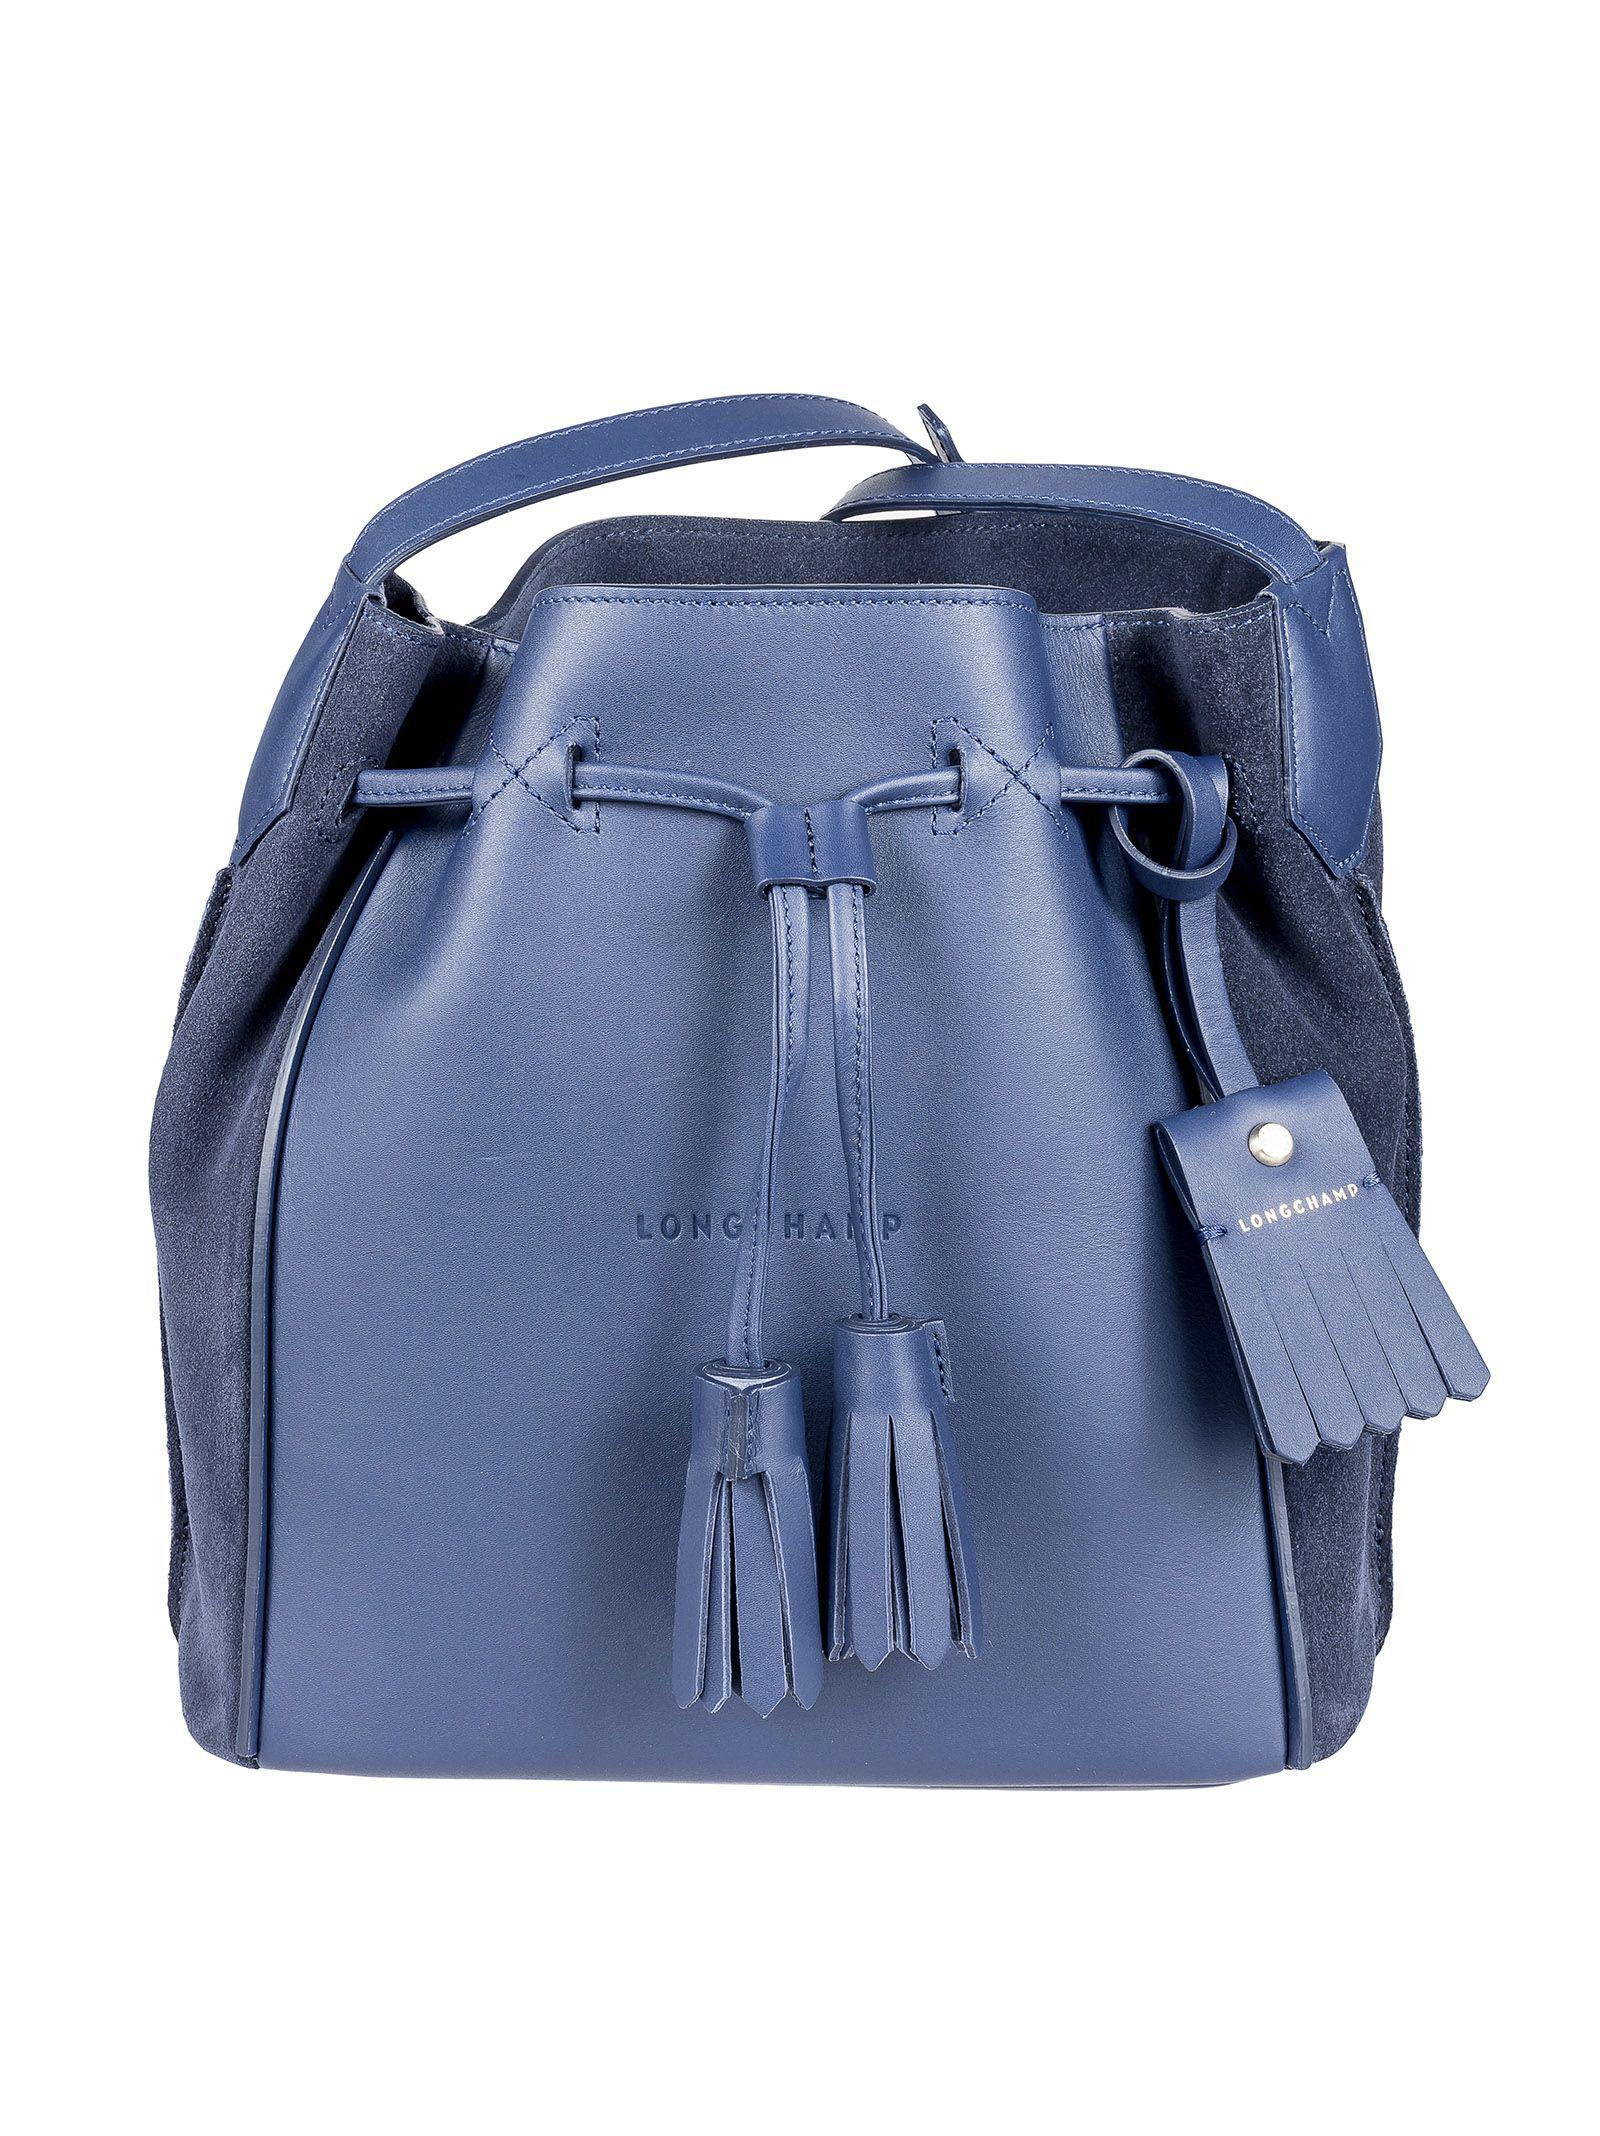 64a50d32c4 LONGCHAMP LONGCHAMP PENELOPE SOFT BUCKET BAG.  longchamp  bags  shoulder  bags  bucket